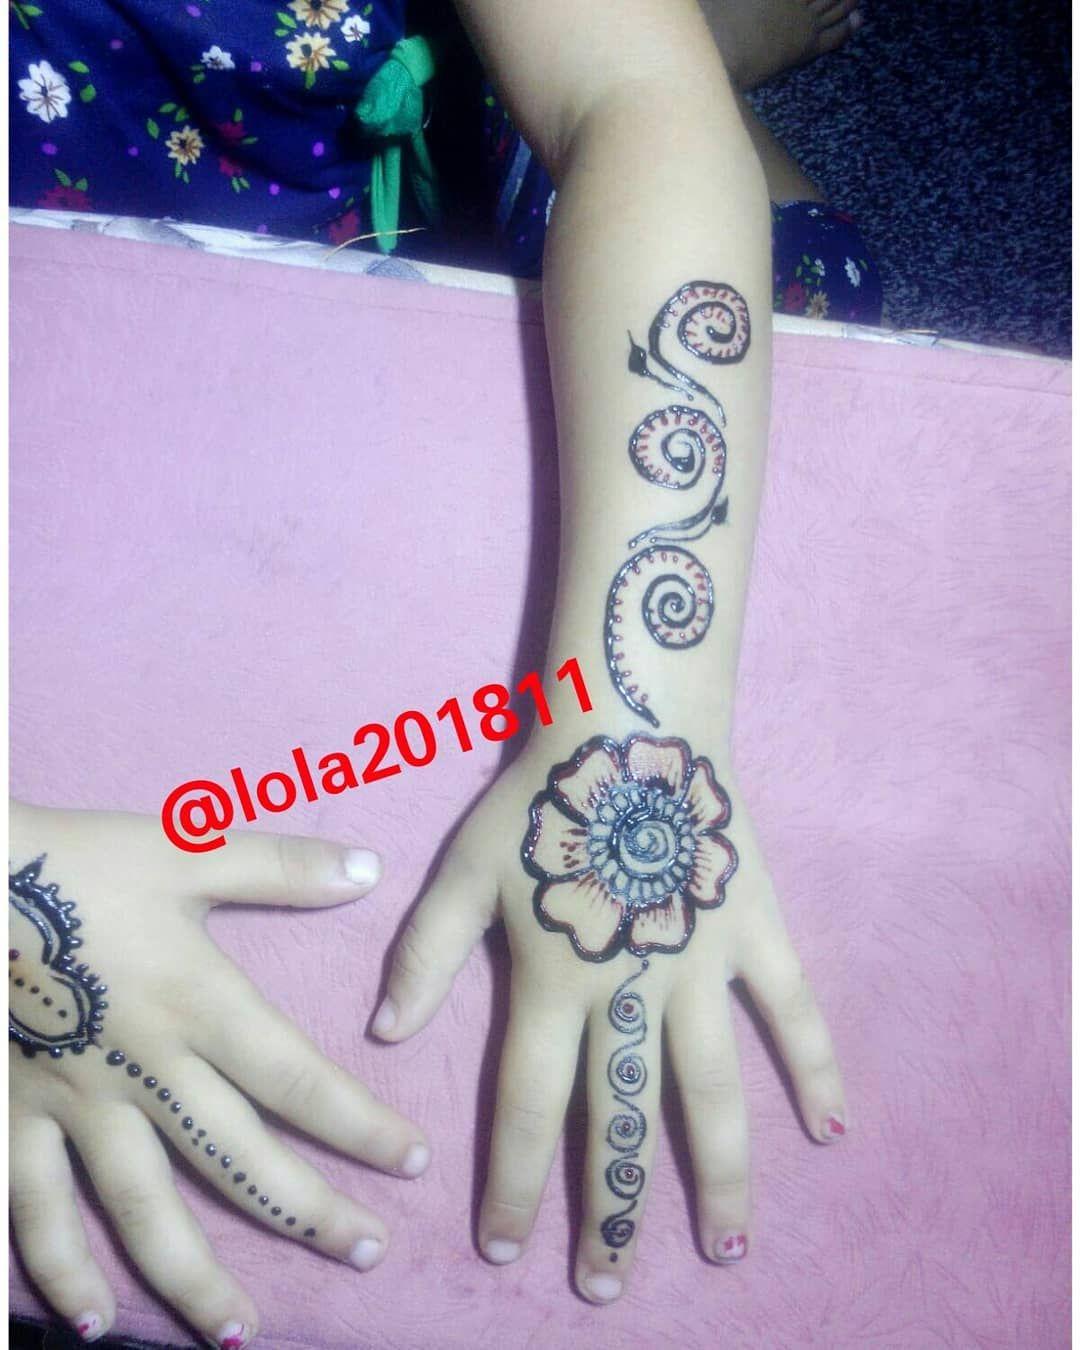 Flowers Pigments Henna Hennatattoo Hennadesign Henna Art Henna Palestine Free Rafah Brown حنا فنون اخضر Hand Henna Henna Hand Tattoo Hand Tattoos